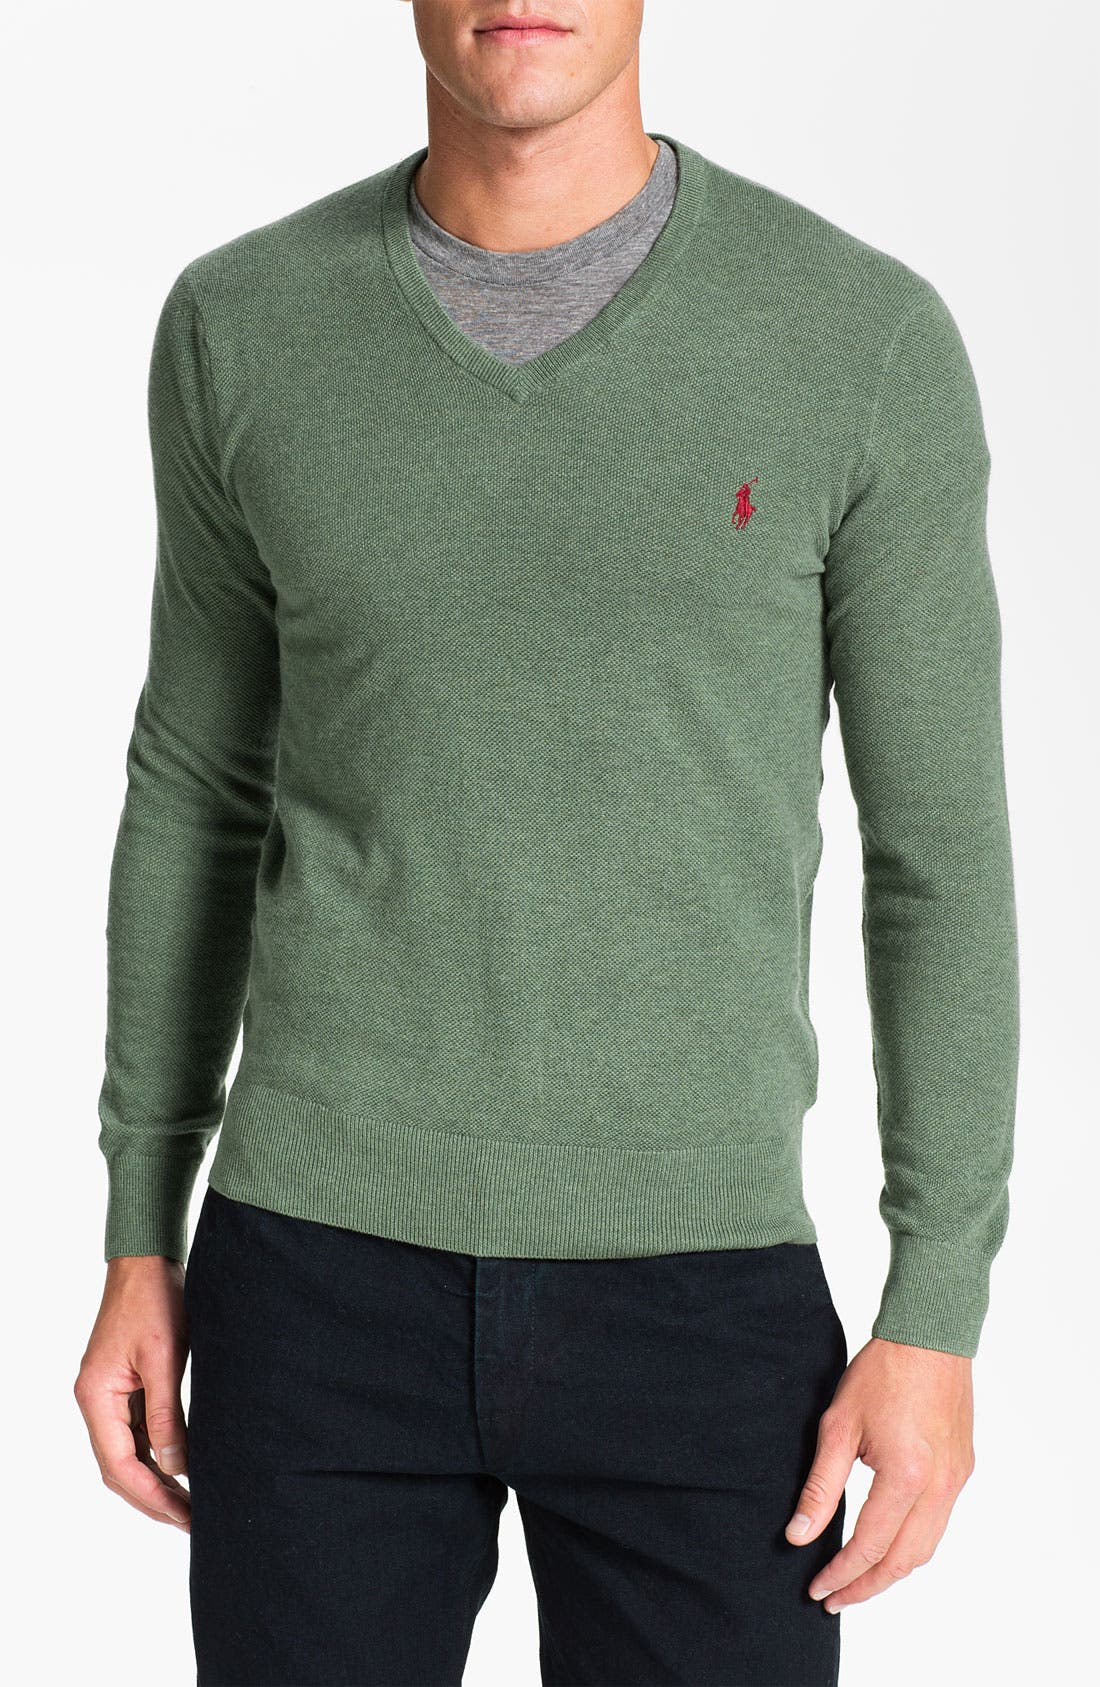 Main Image - Polo Ralph Lauren V-Neck Cotton & Cashmere Classic Fit Sweater